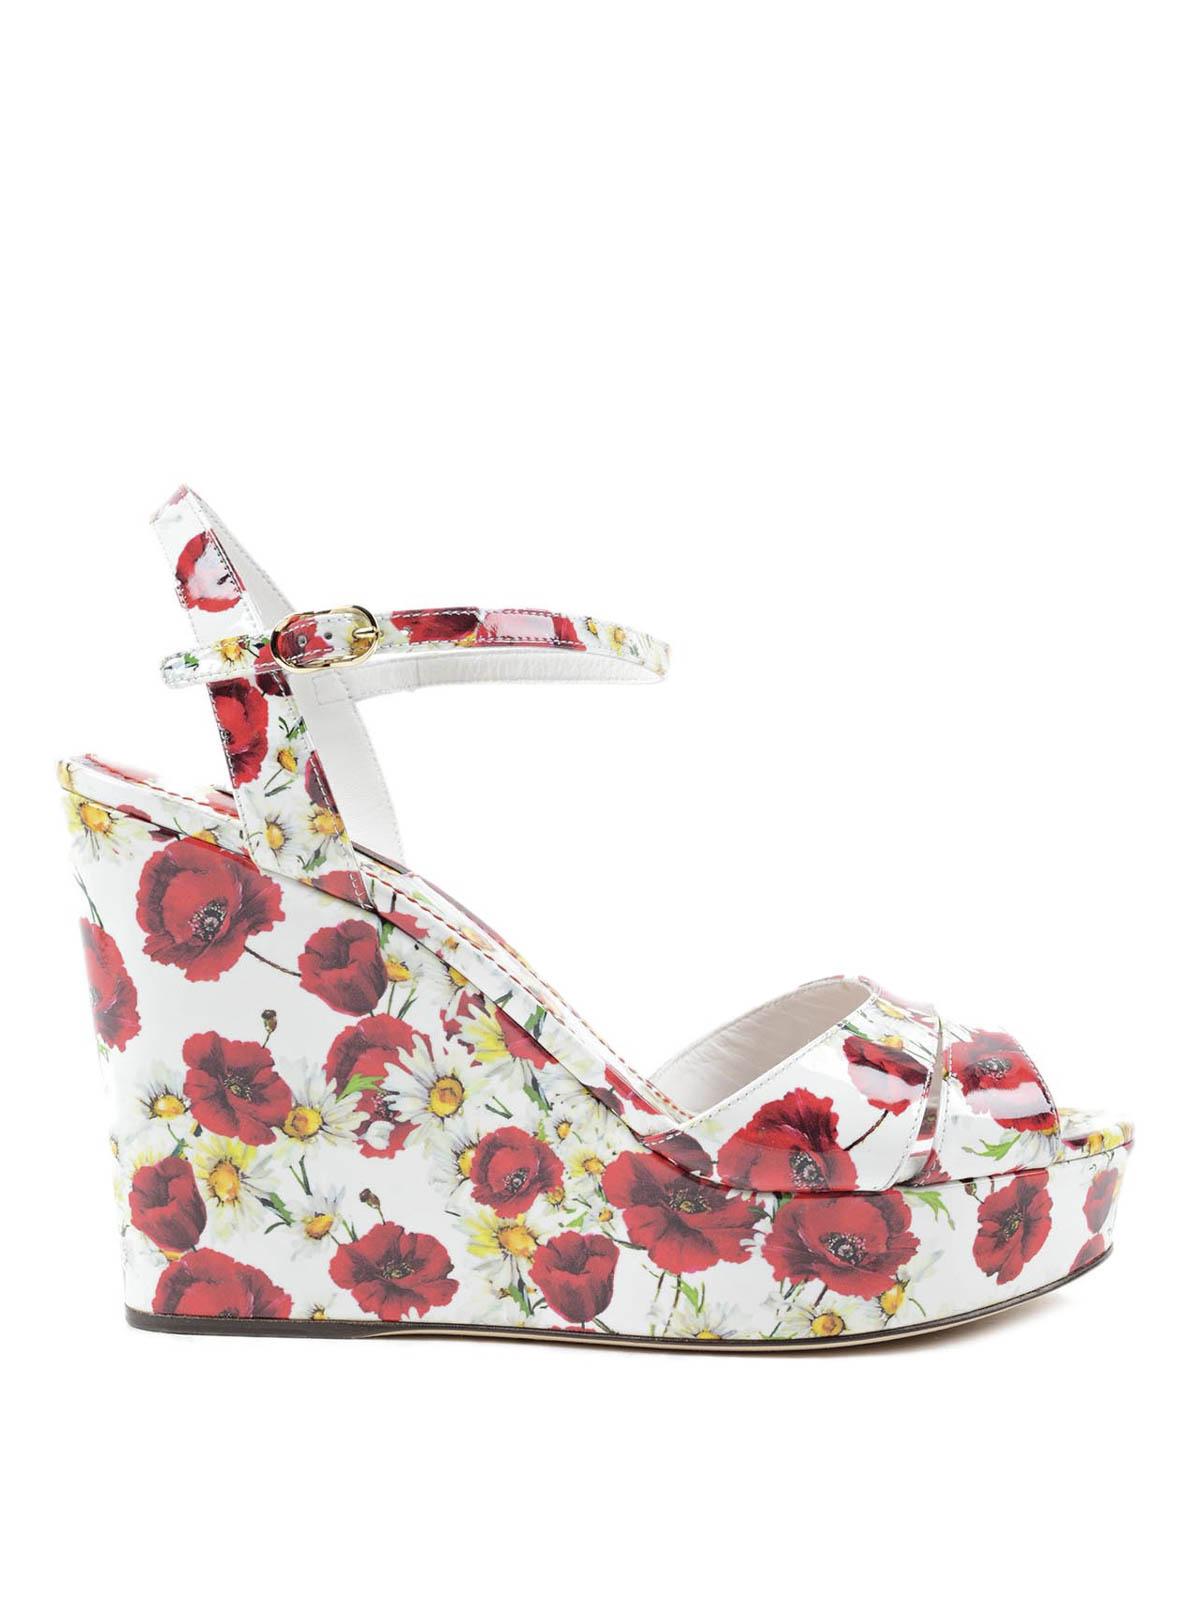 DOLCE   GABBANA  sandali online - Sandalo con zeppa e stampa floreale a3c5f77a67d